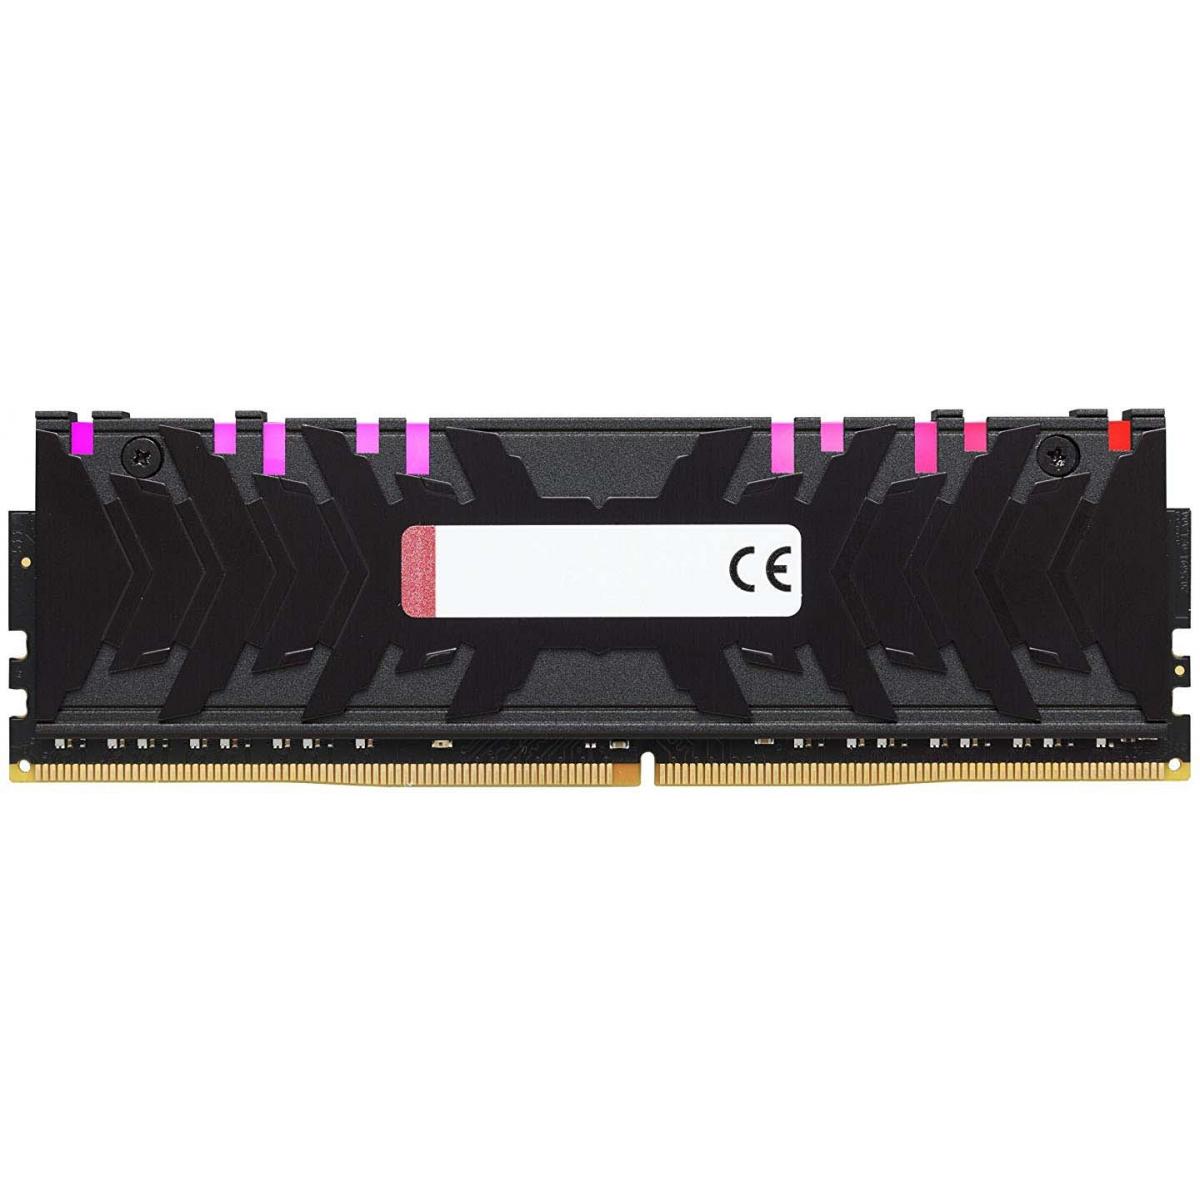 Memória DDR4 Kingston HyperX Predator RGB, 8GB 3000MHz, HX430C15PB3A/8